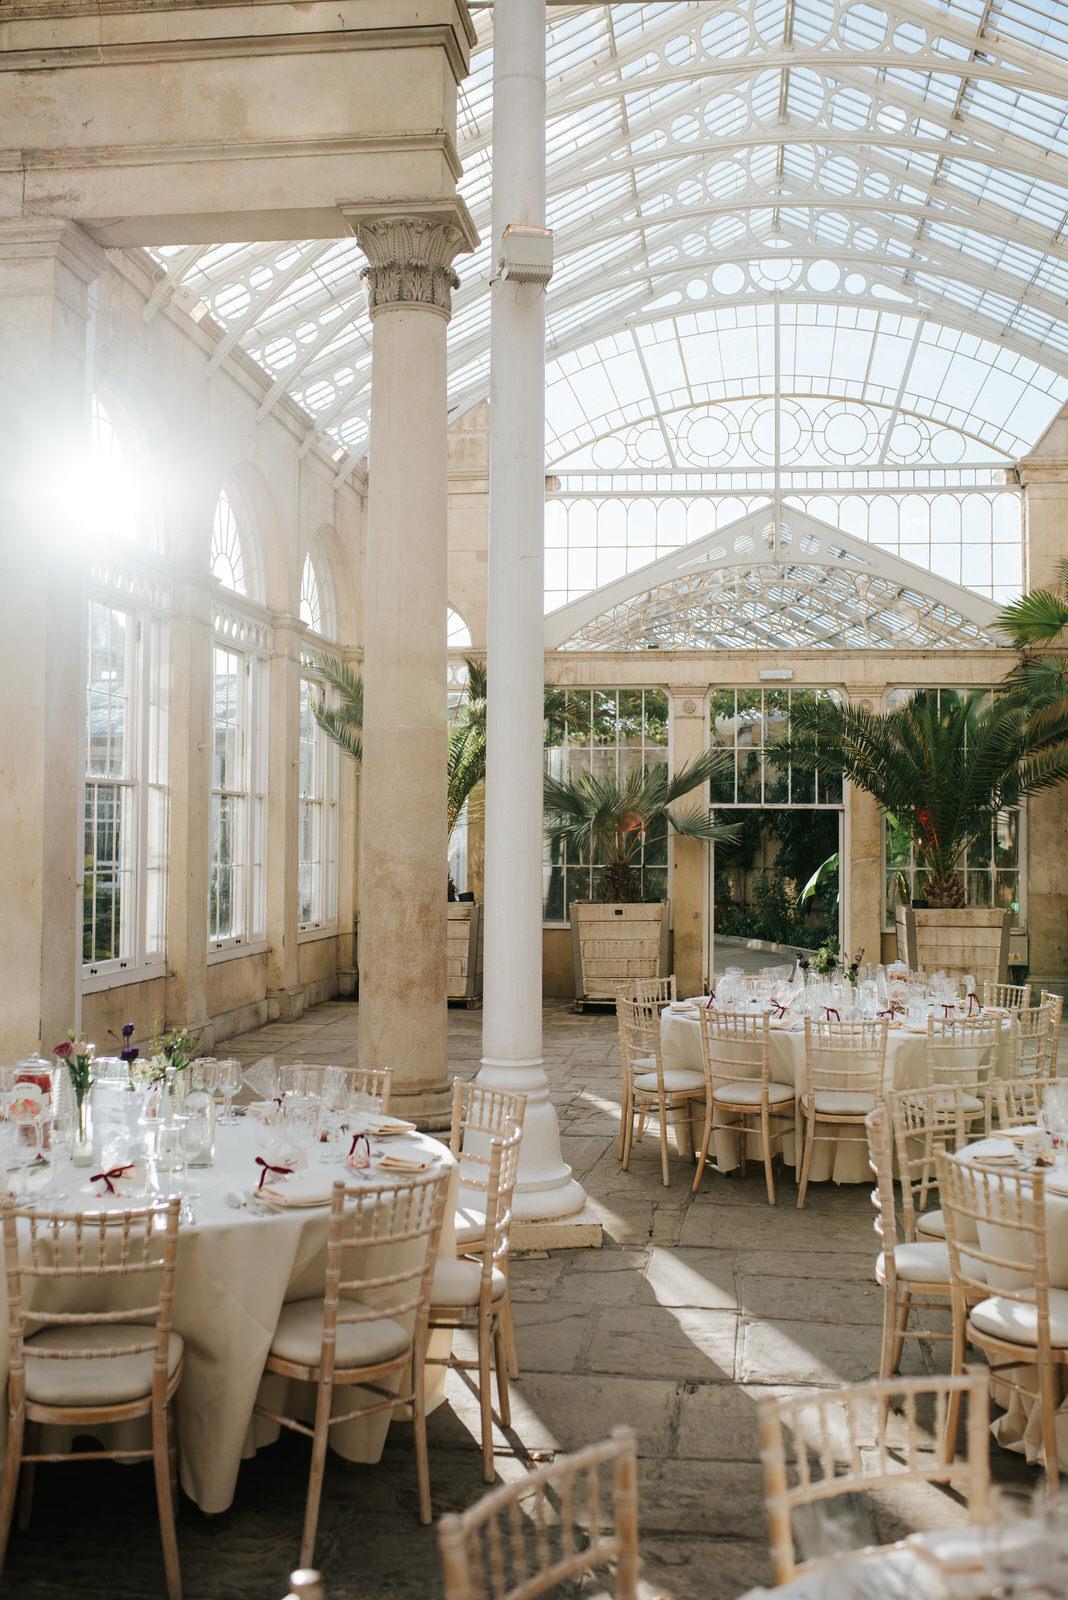 Syon House Great Conservatory decoration inspiration photo